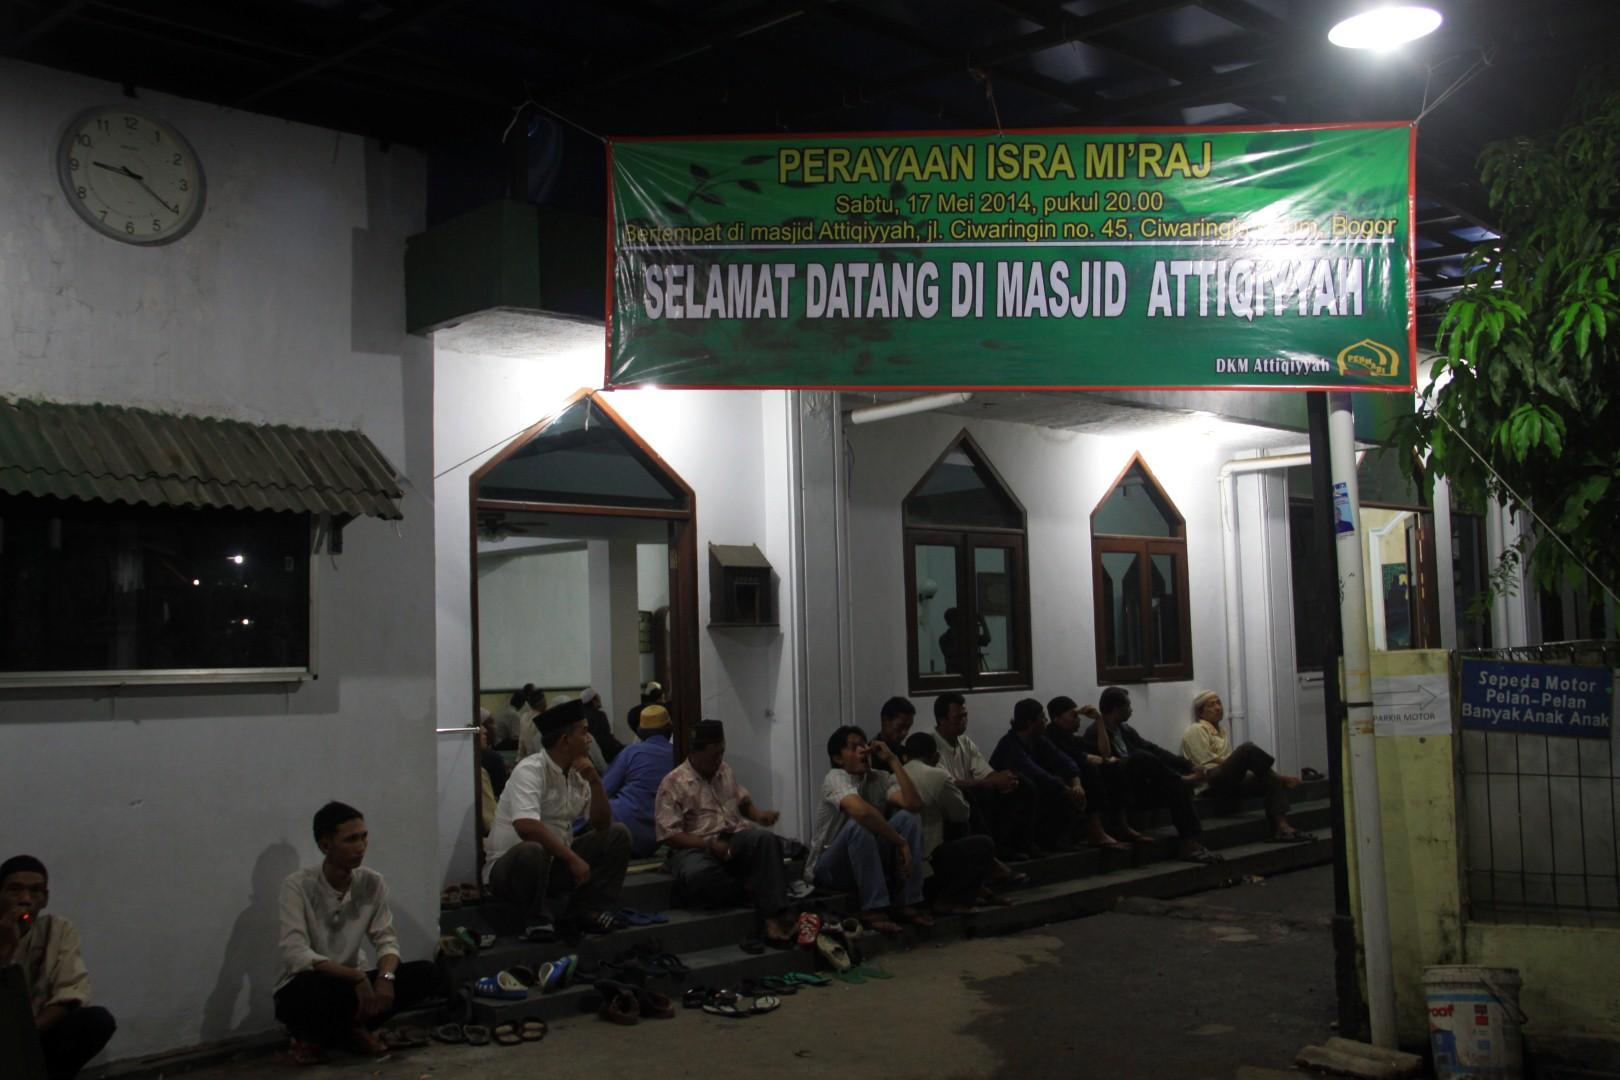 Isra' Mi'raj Bersama Permabi-DKM Al-Atiqiyah Bogor